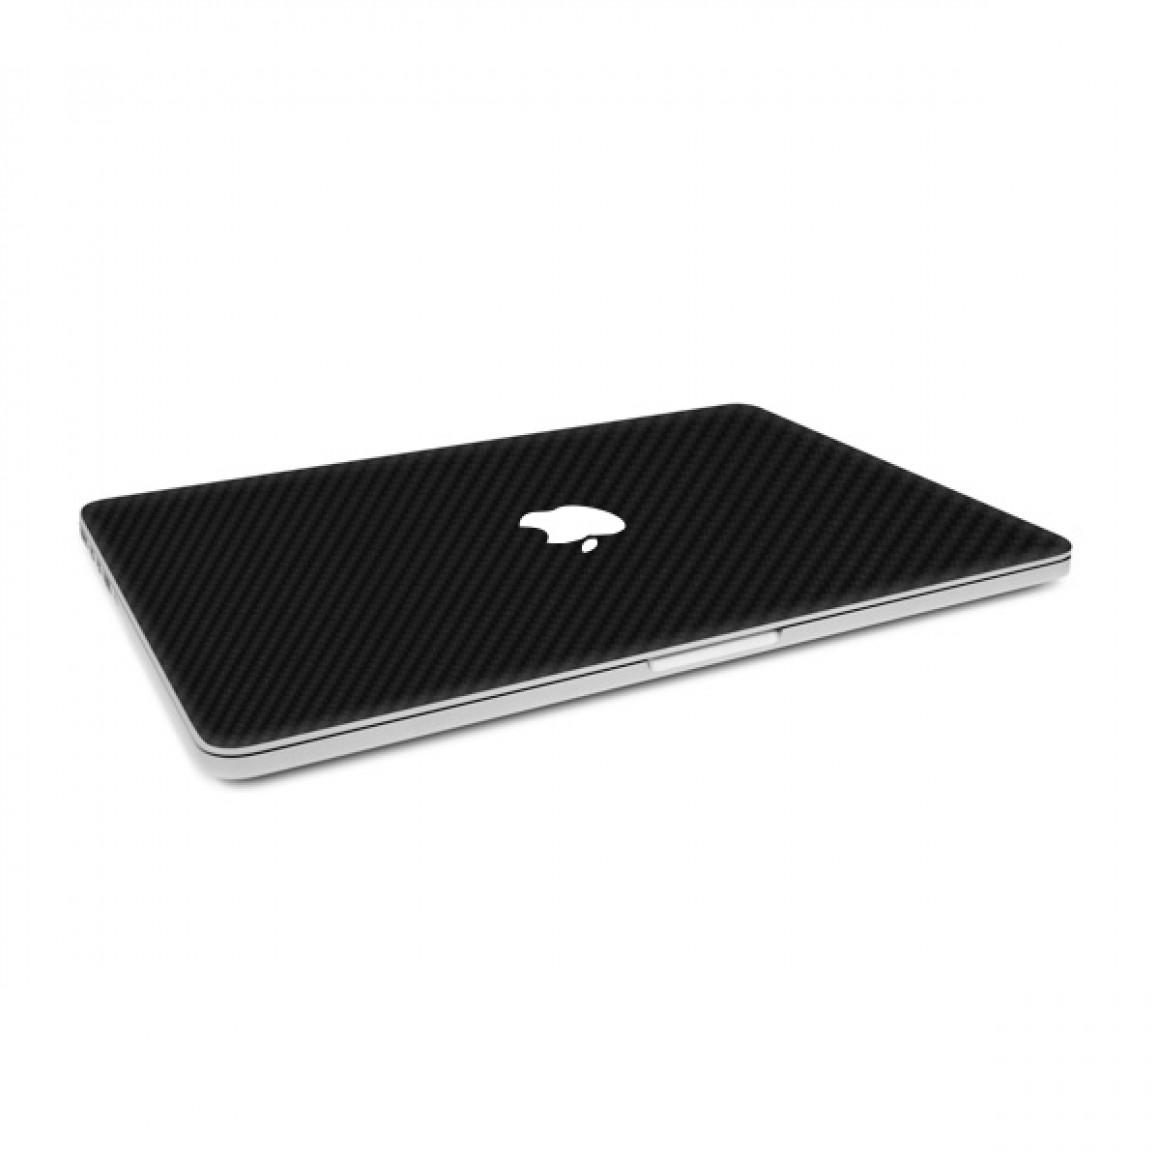 Skin Adesivo Fibra De Carbono Cima E Base Para Macbook Pro 13 A1278